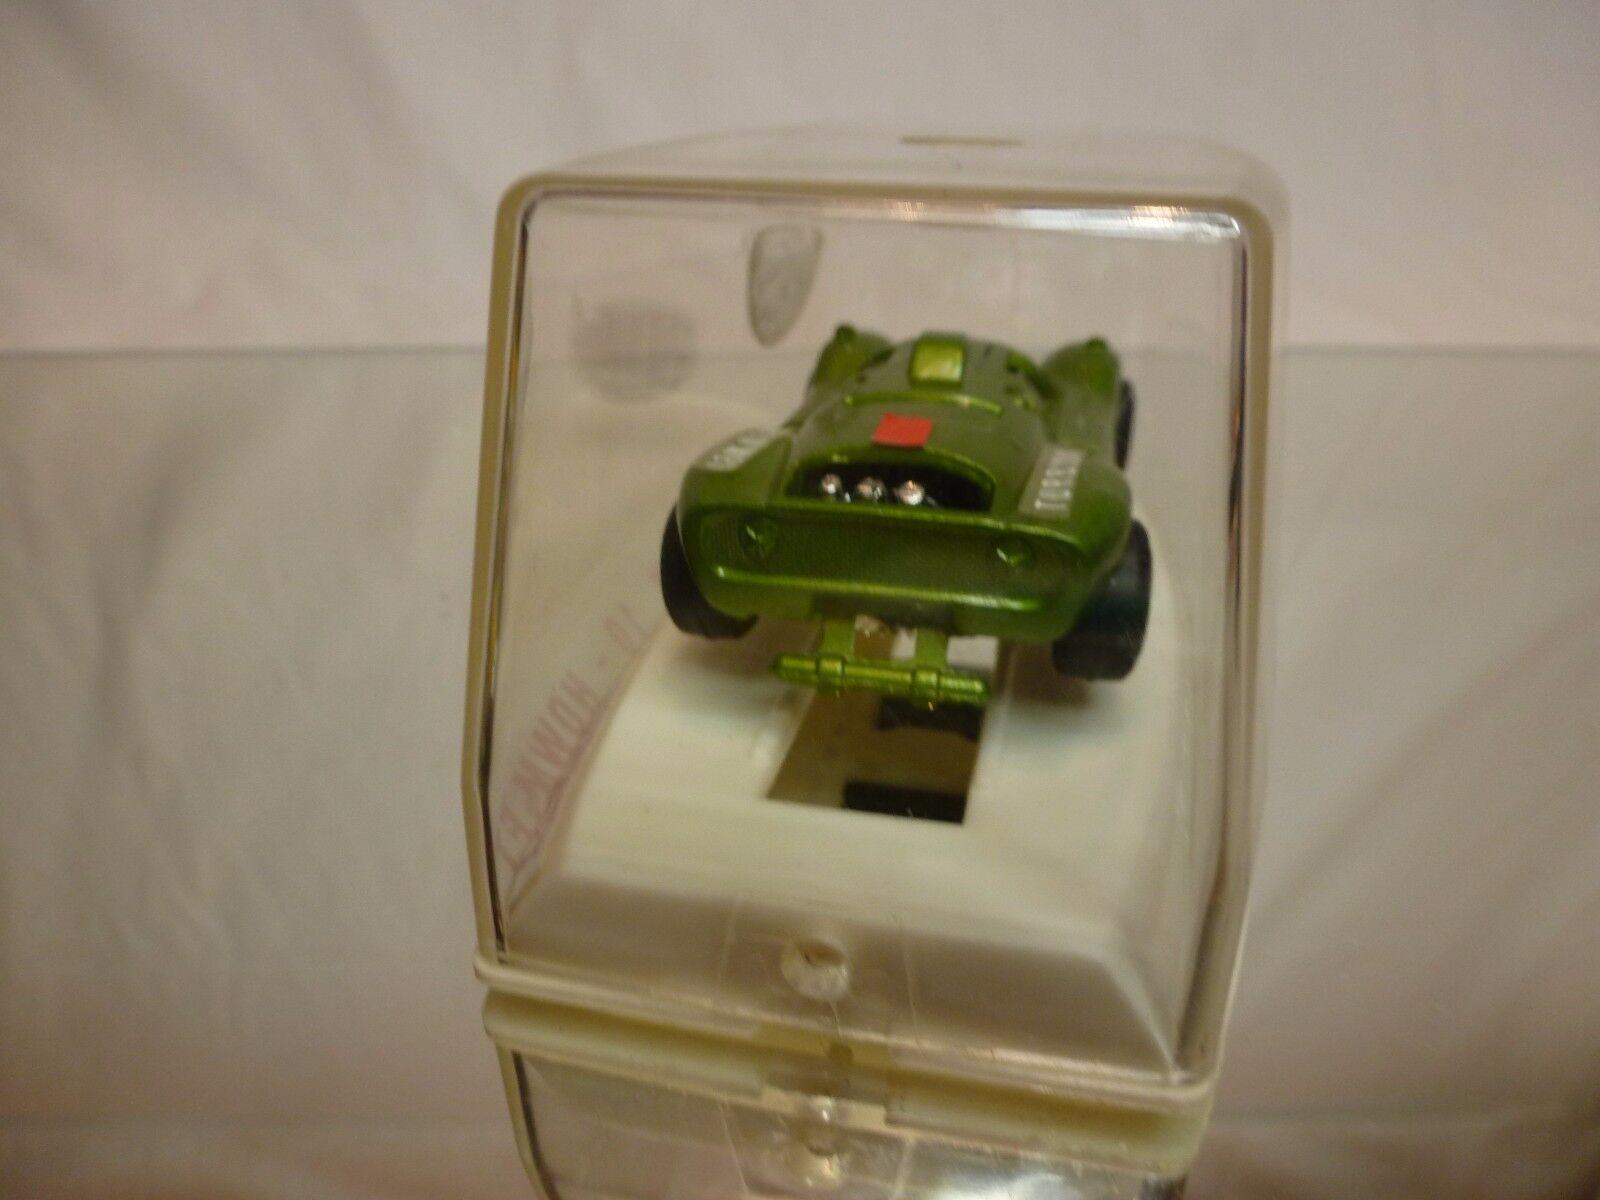 POLITOYS M10 HOWMET TX TURBINA - - - verde METALLIC 1 43 - VERY GOOD IN BOX 7ccaf2